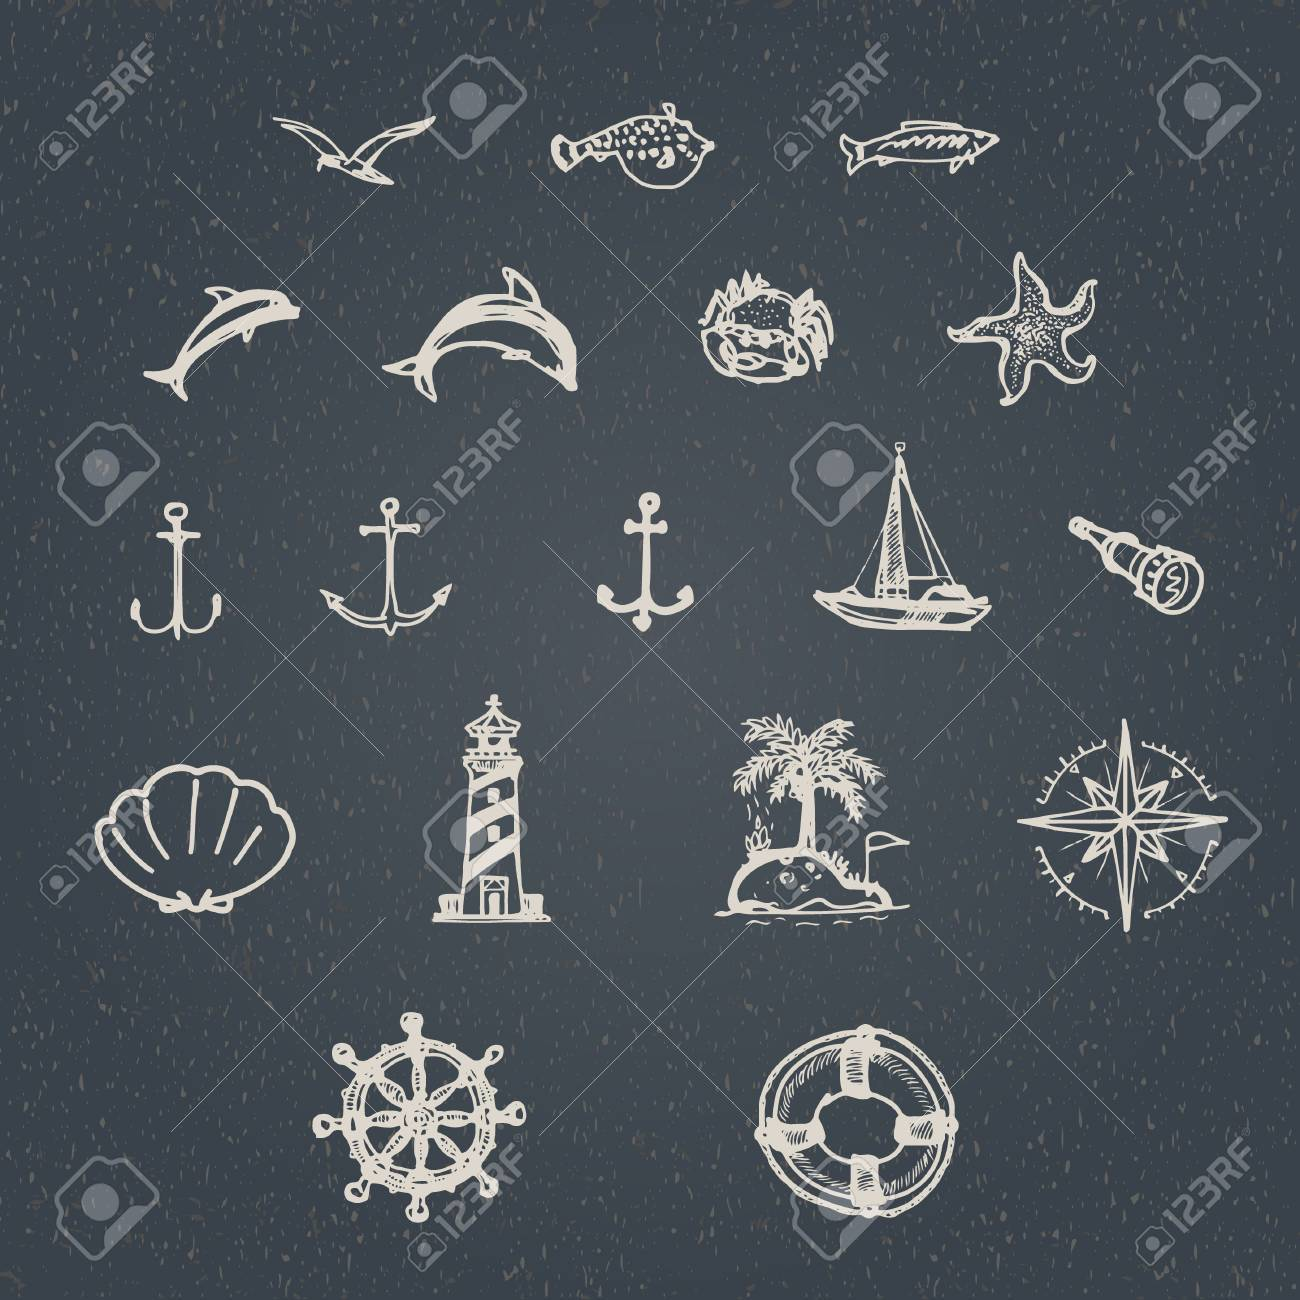 Vector Set Of Hand Drawn Vintage Nautical Signs And Symbols Royalty